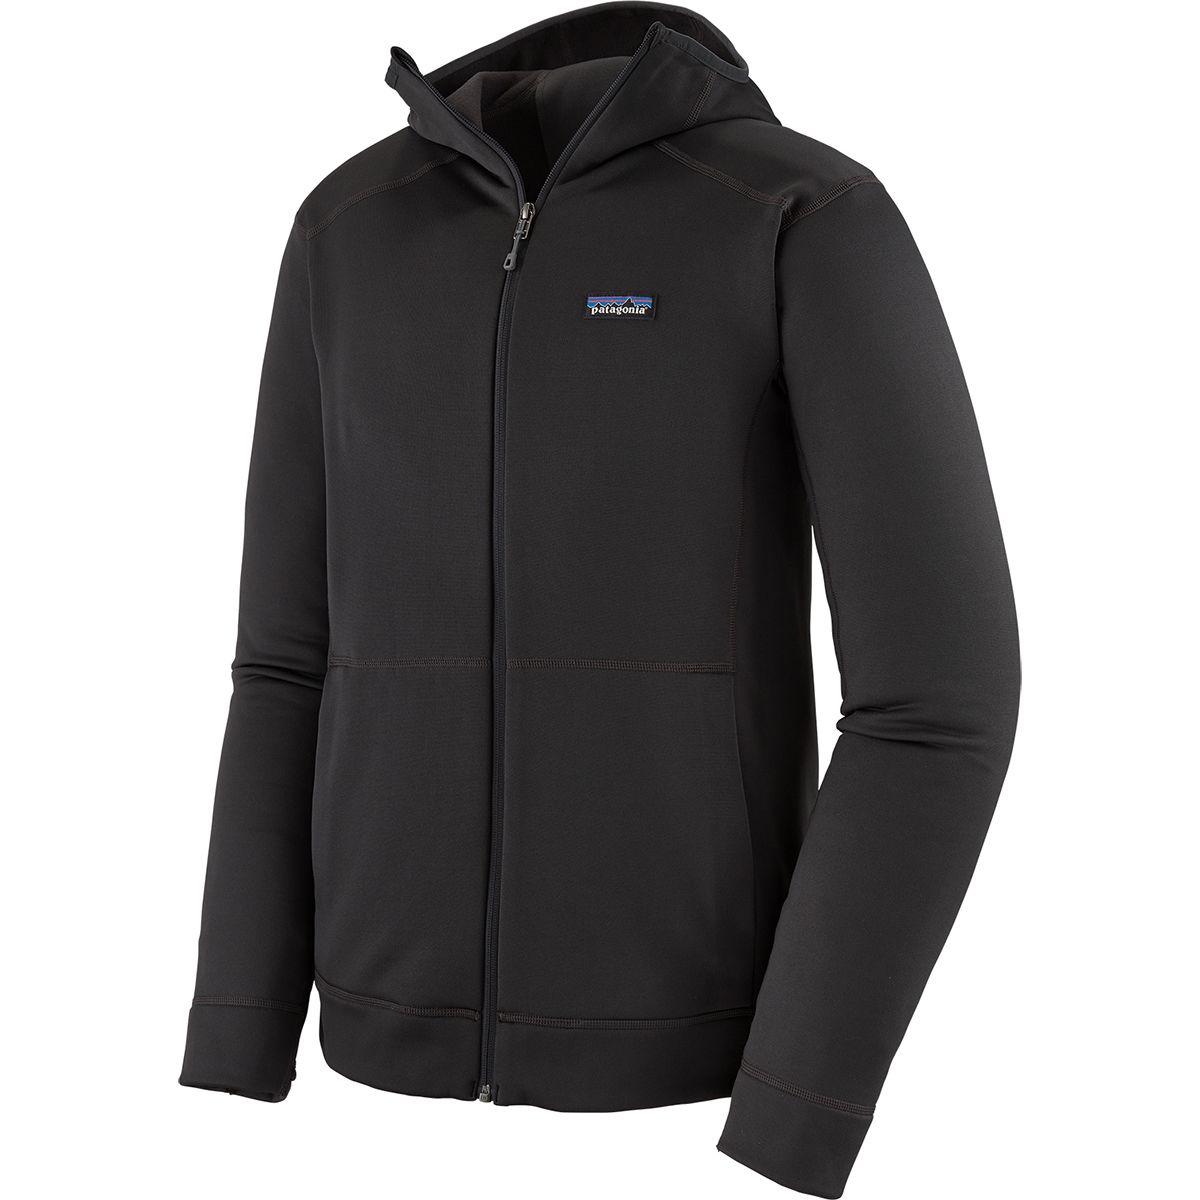 photo: Patagonia Men's Crosstrek Hoody fleece jacket